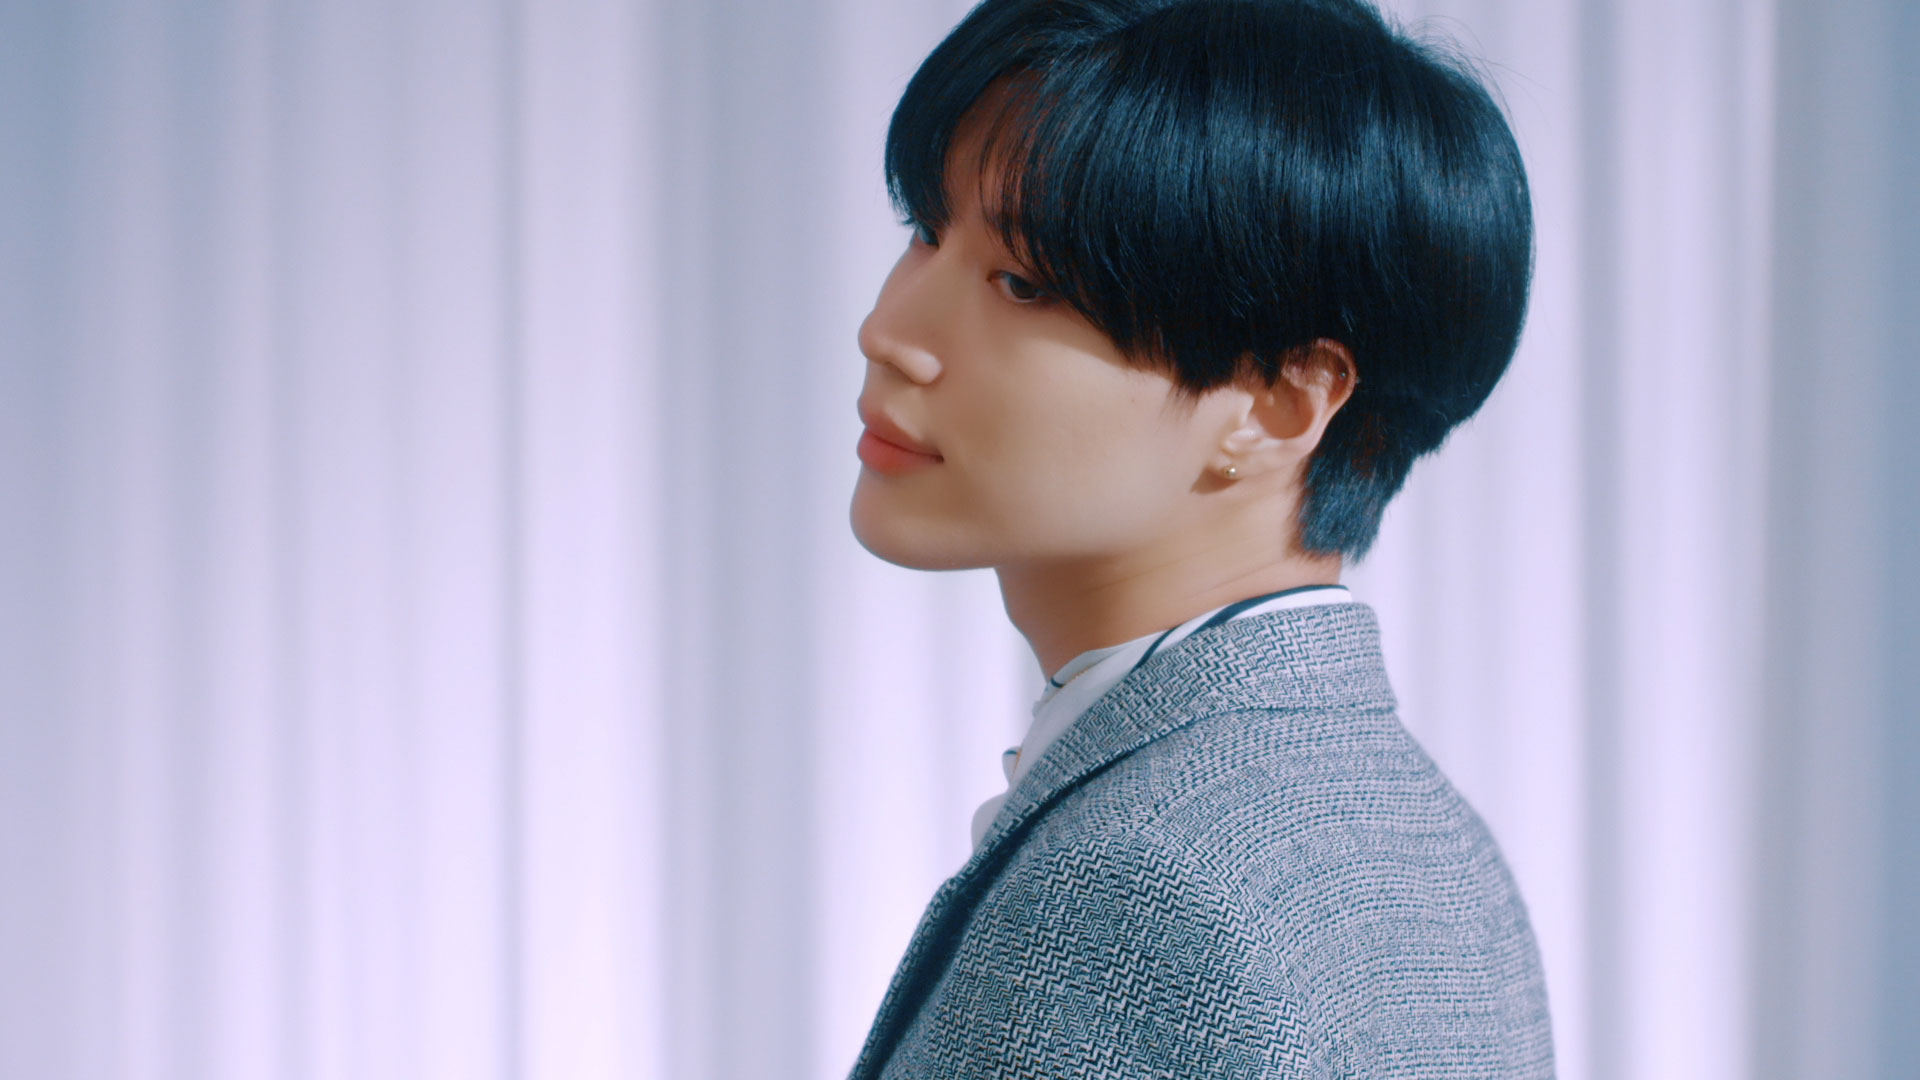 [STATION] TAEMIN 태민 'Be Your Enemy' Live Video Teaser